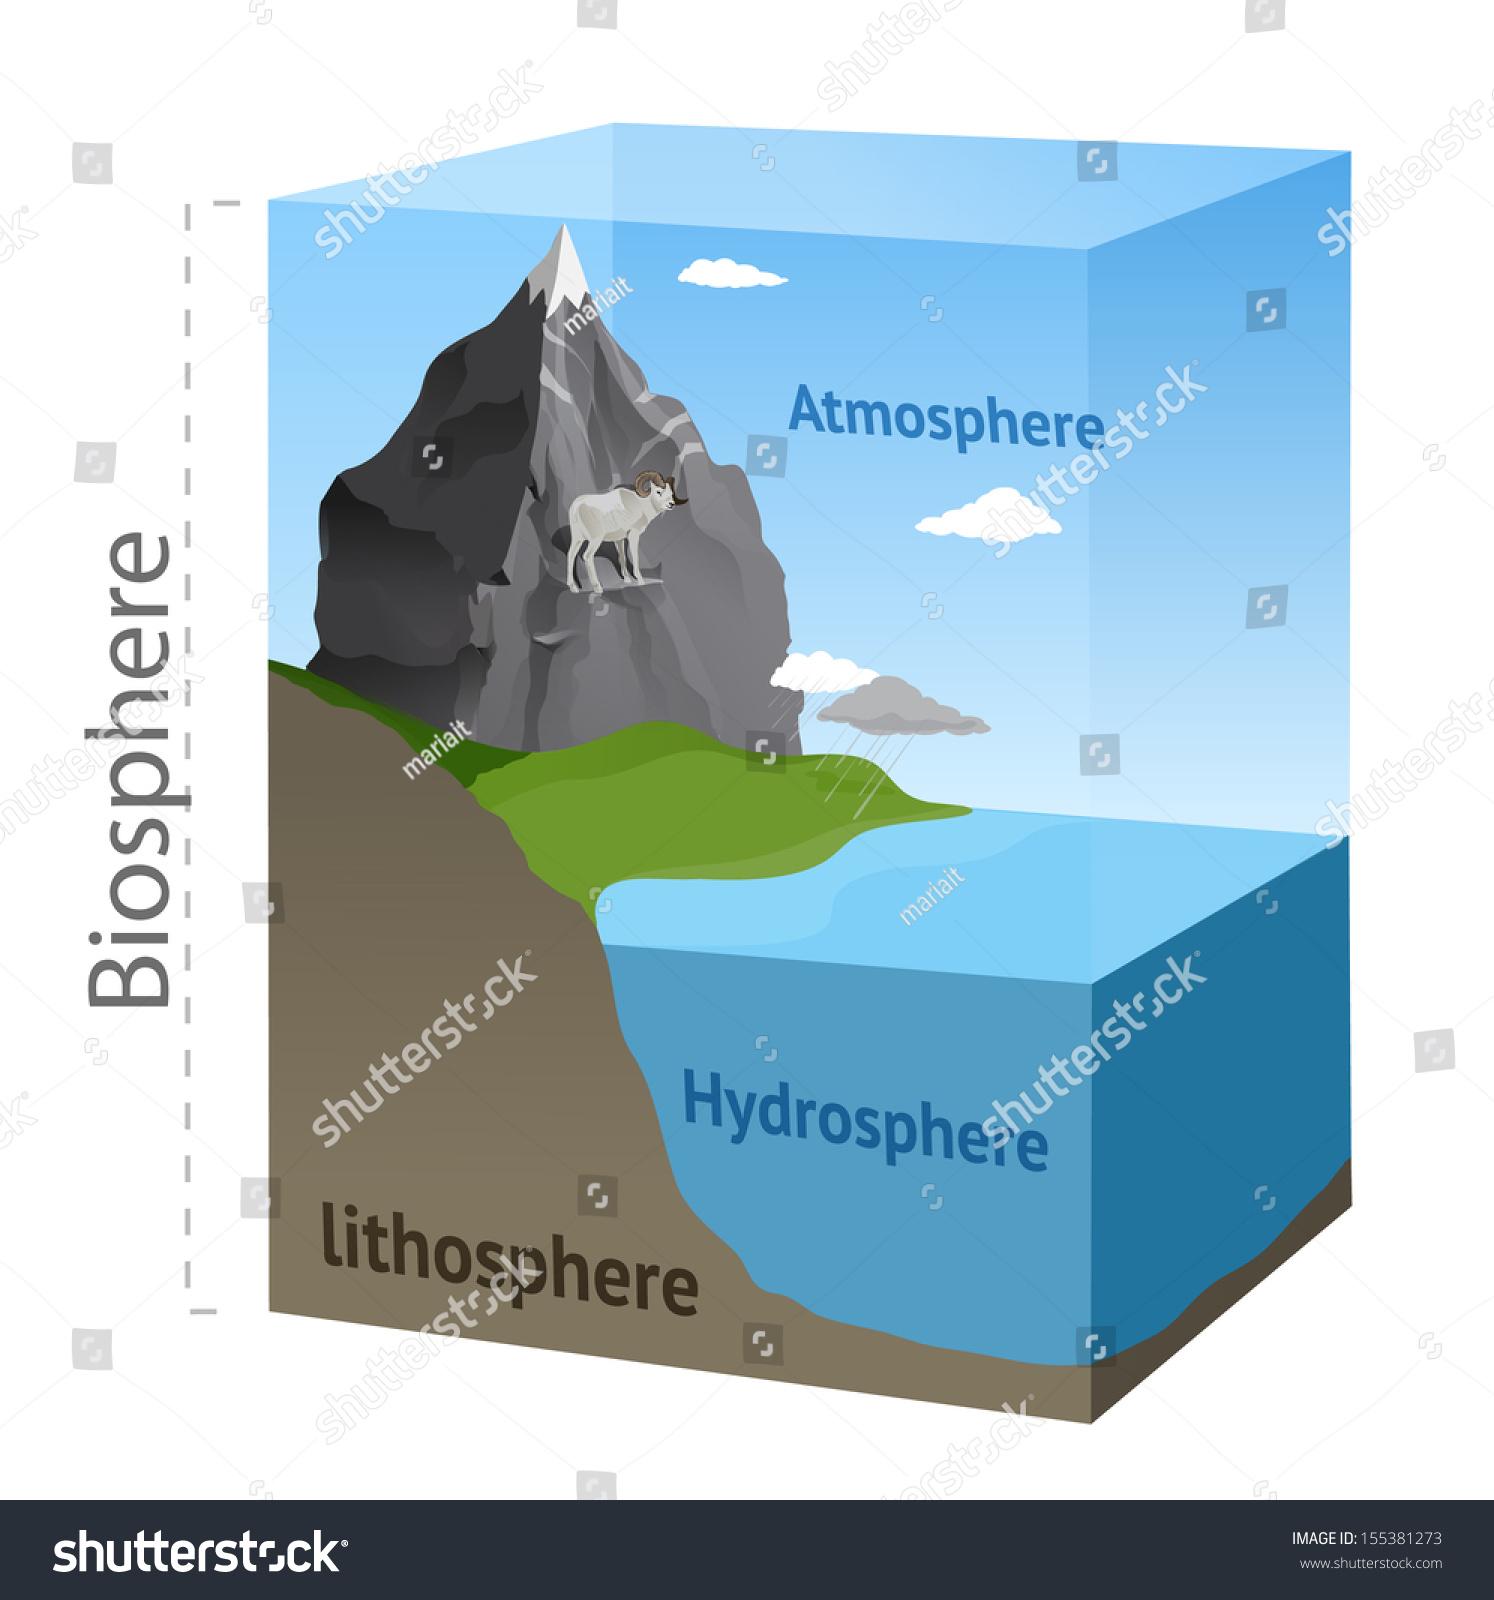 hydrosphere lithosphere atmosphere diagram plot of the maze runner biosphere illustration vector stock 155381273